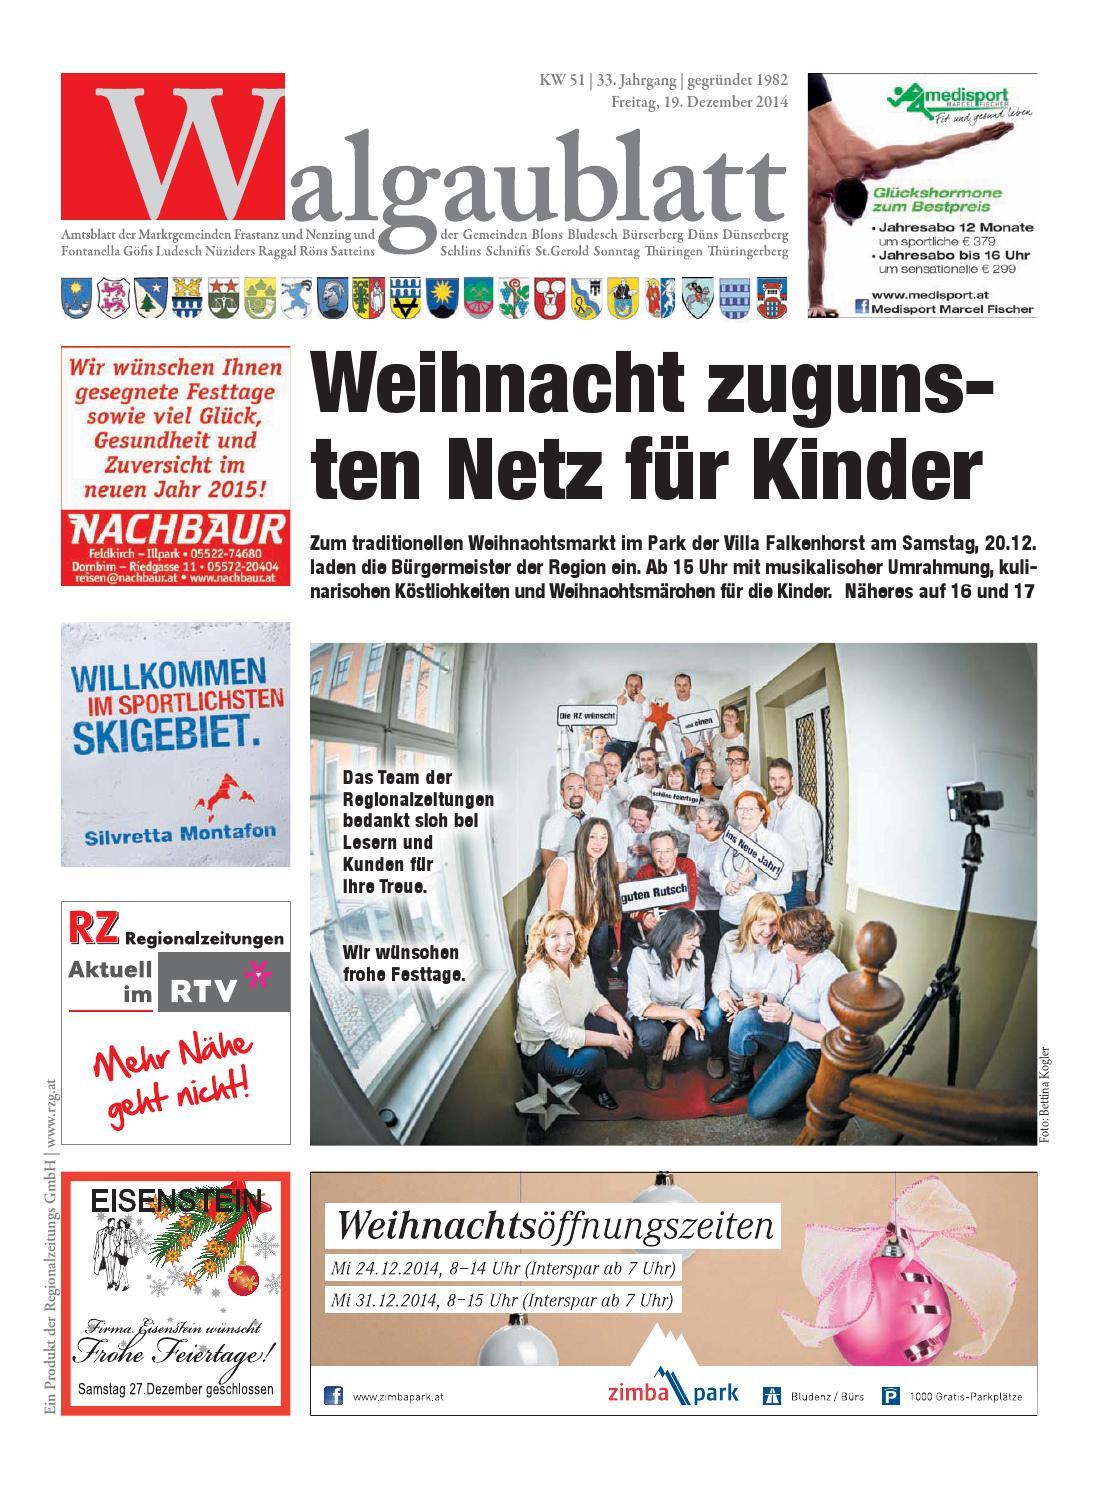 Walgaublatt 51 by Regionalzeitungs GmbH - issuu